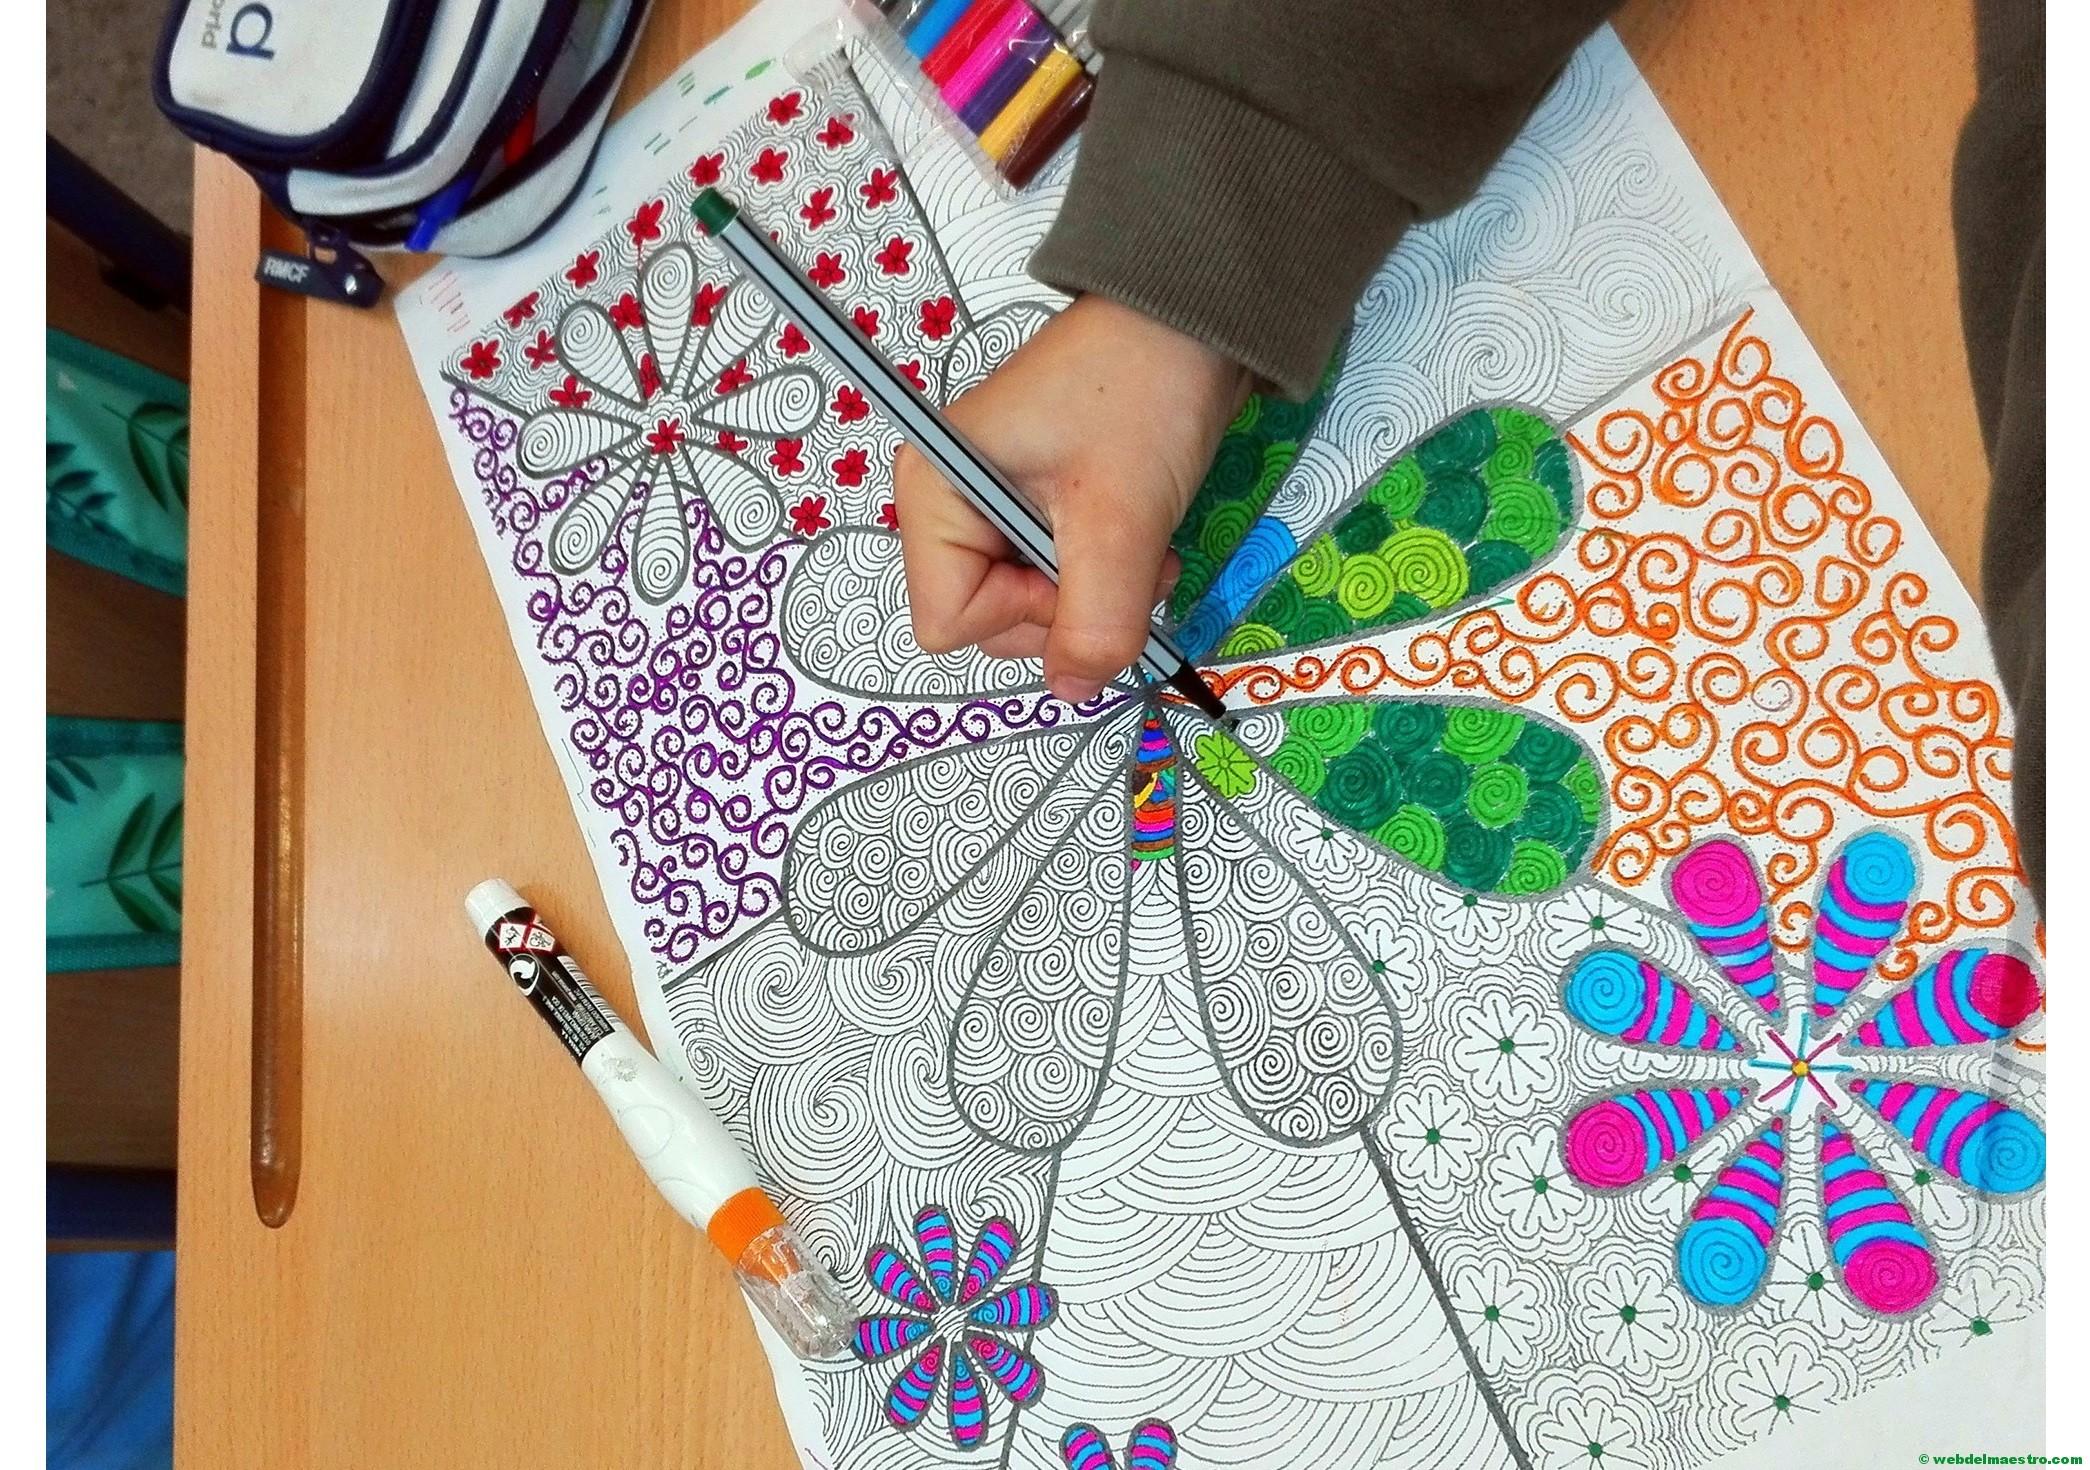 Dibujos para colorear e imprimir - Terapia antiestrés